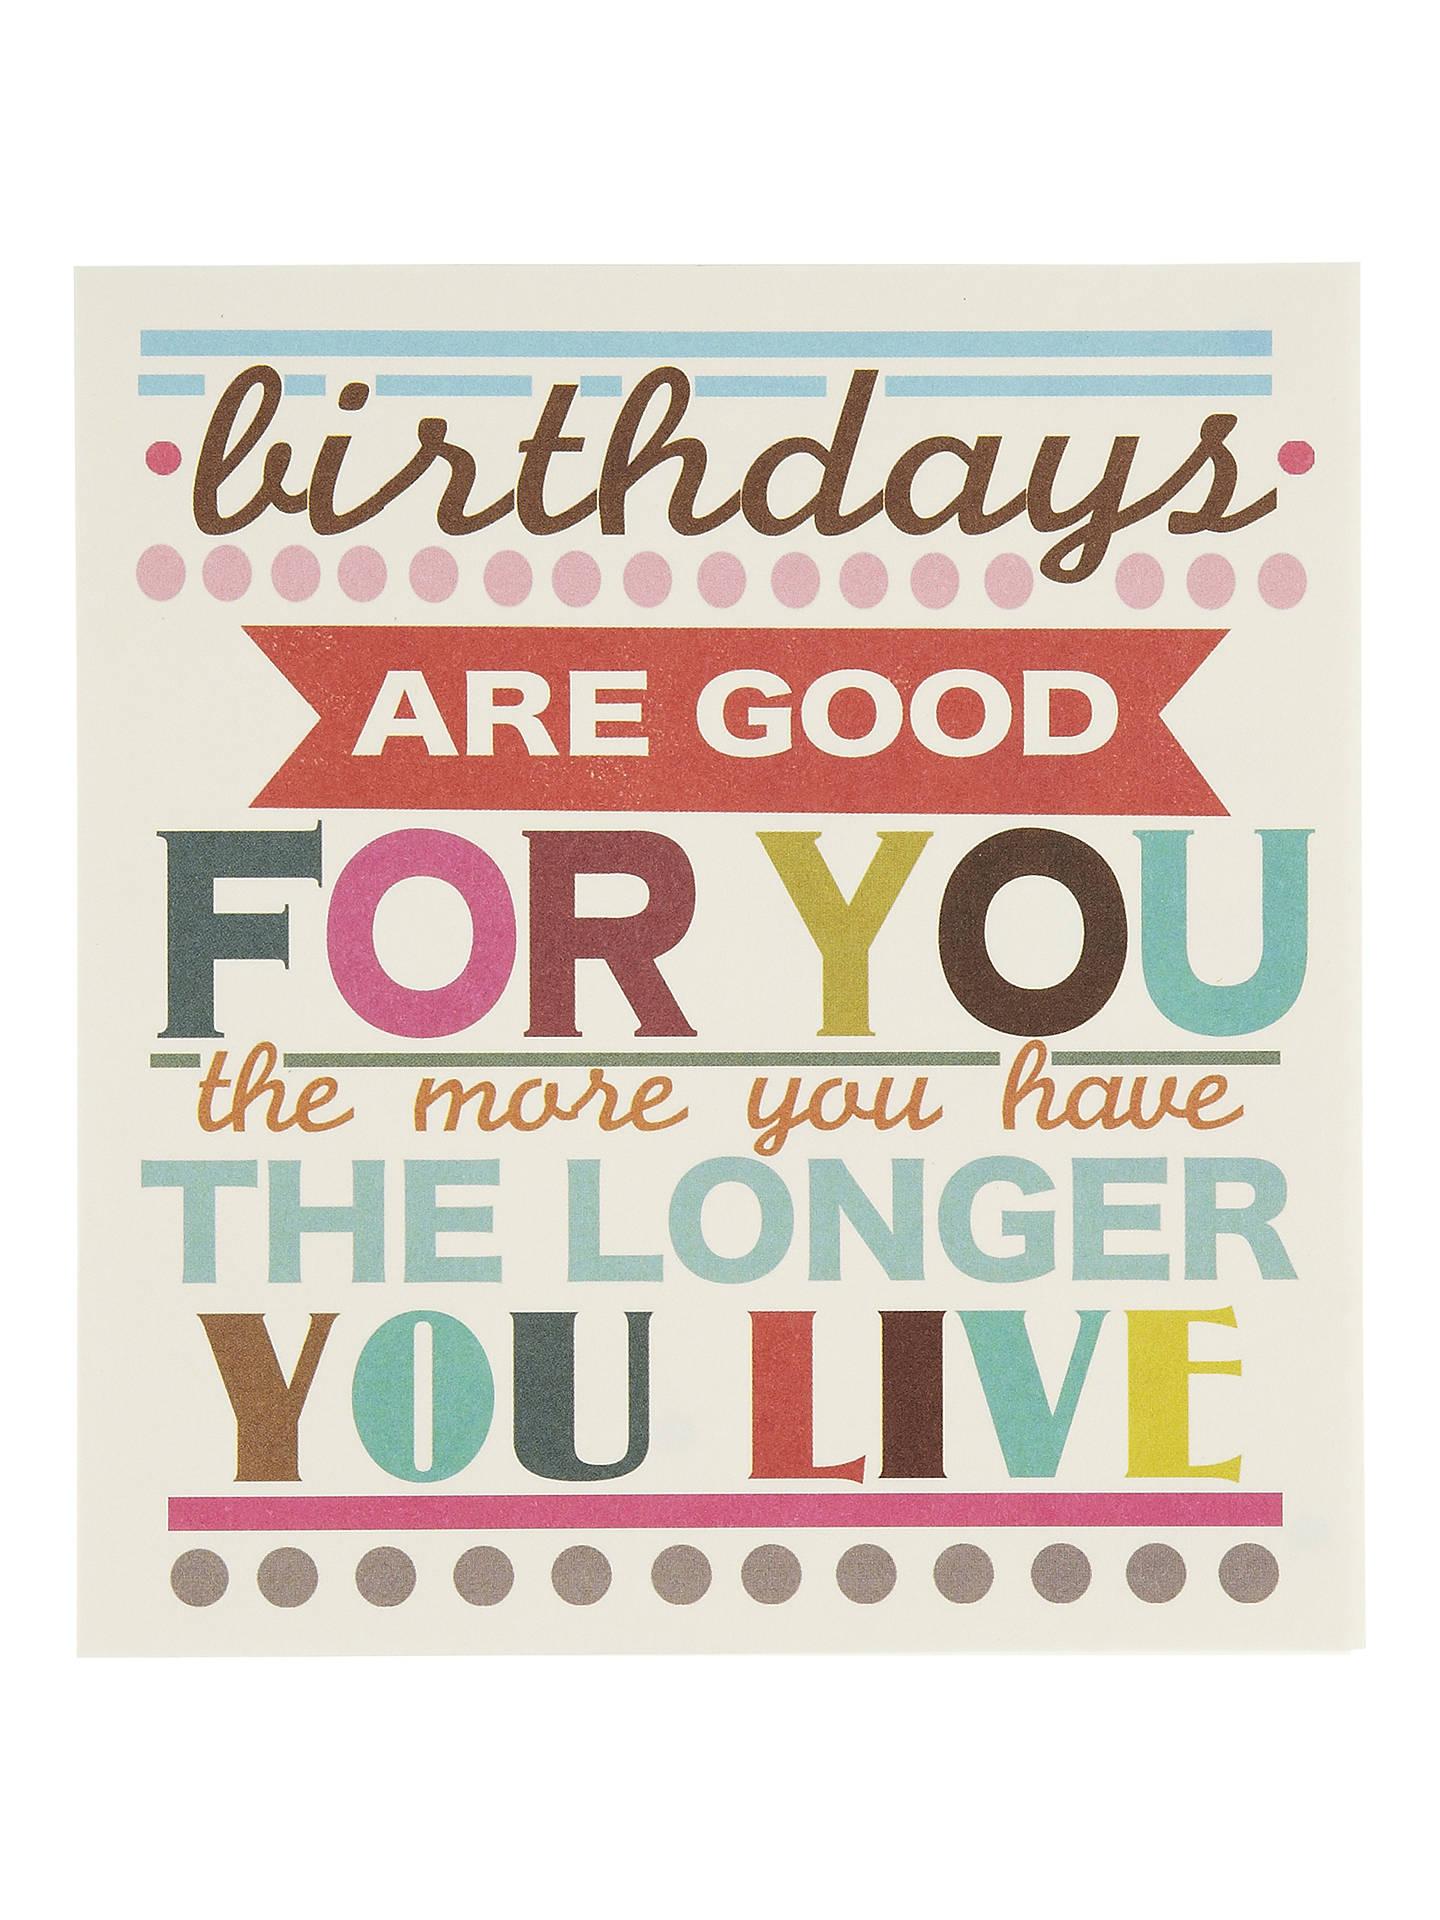 caroline gardner birthdays are good for you birthday card at john